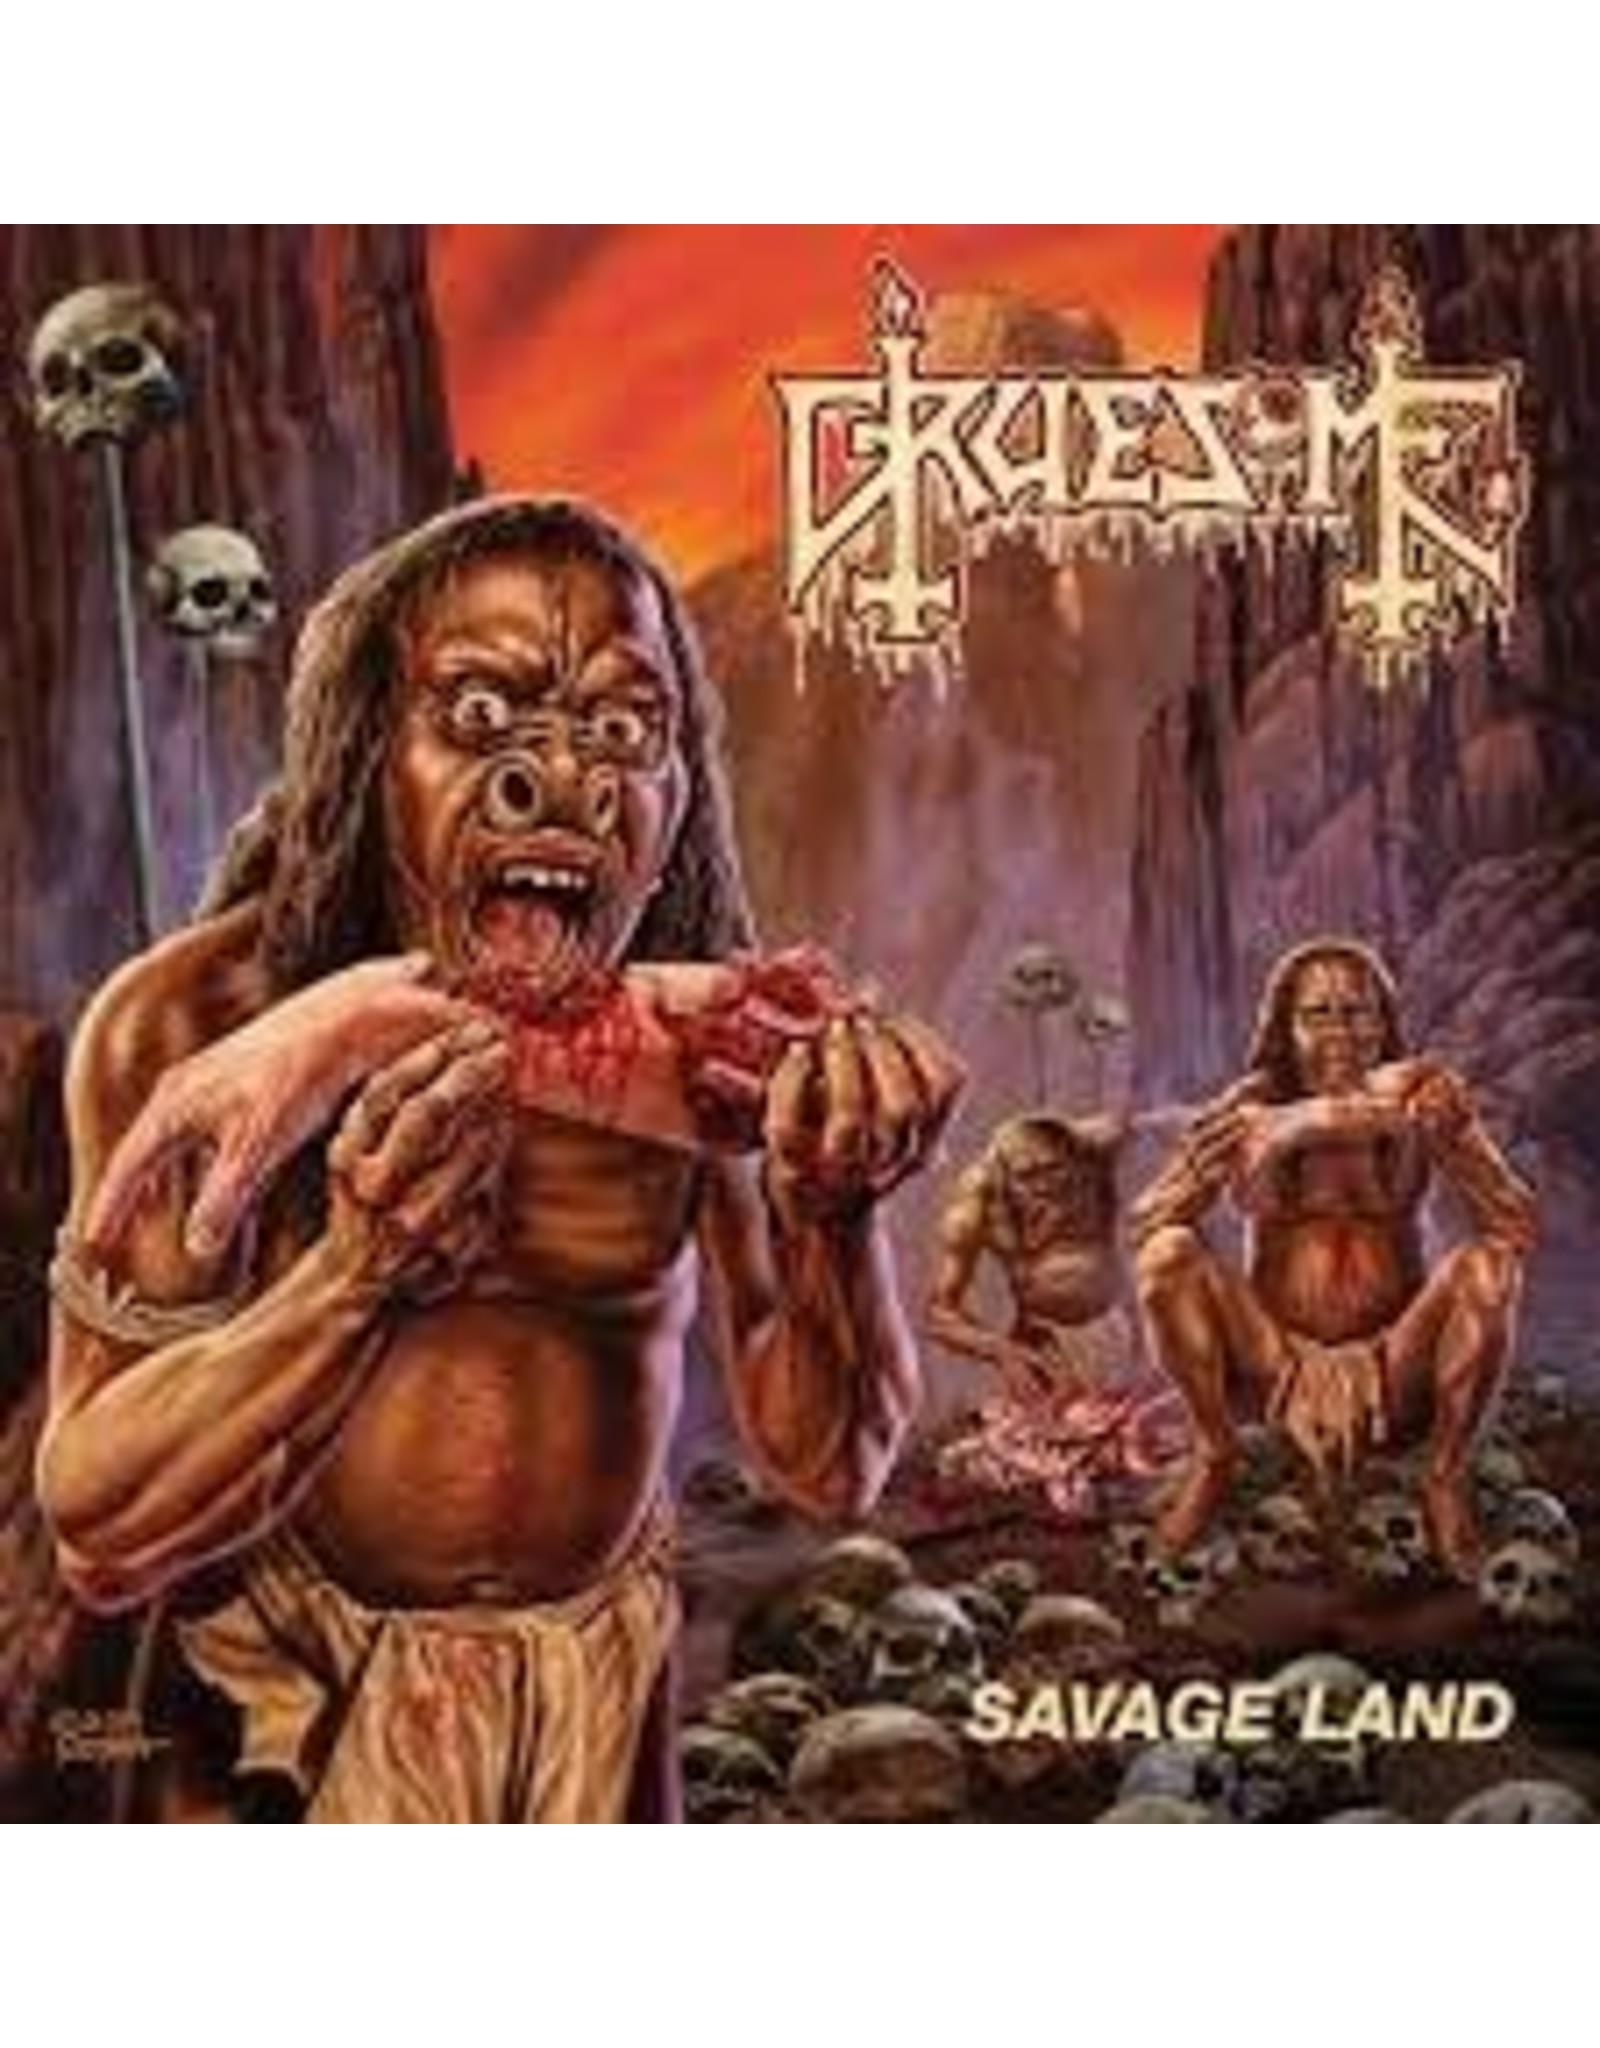 Gruesome - Savage Land LP (Bone + Blood Ltd. Vinyl)